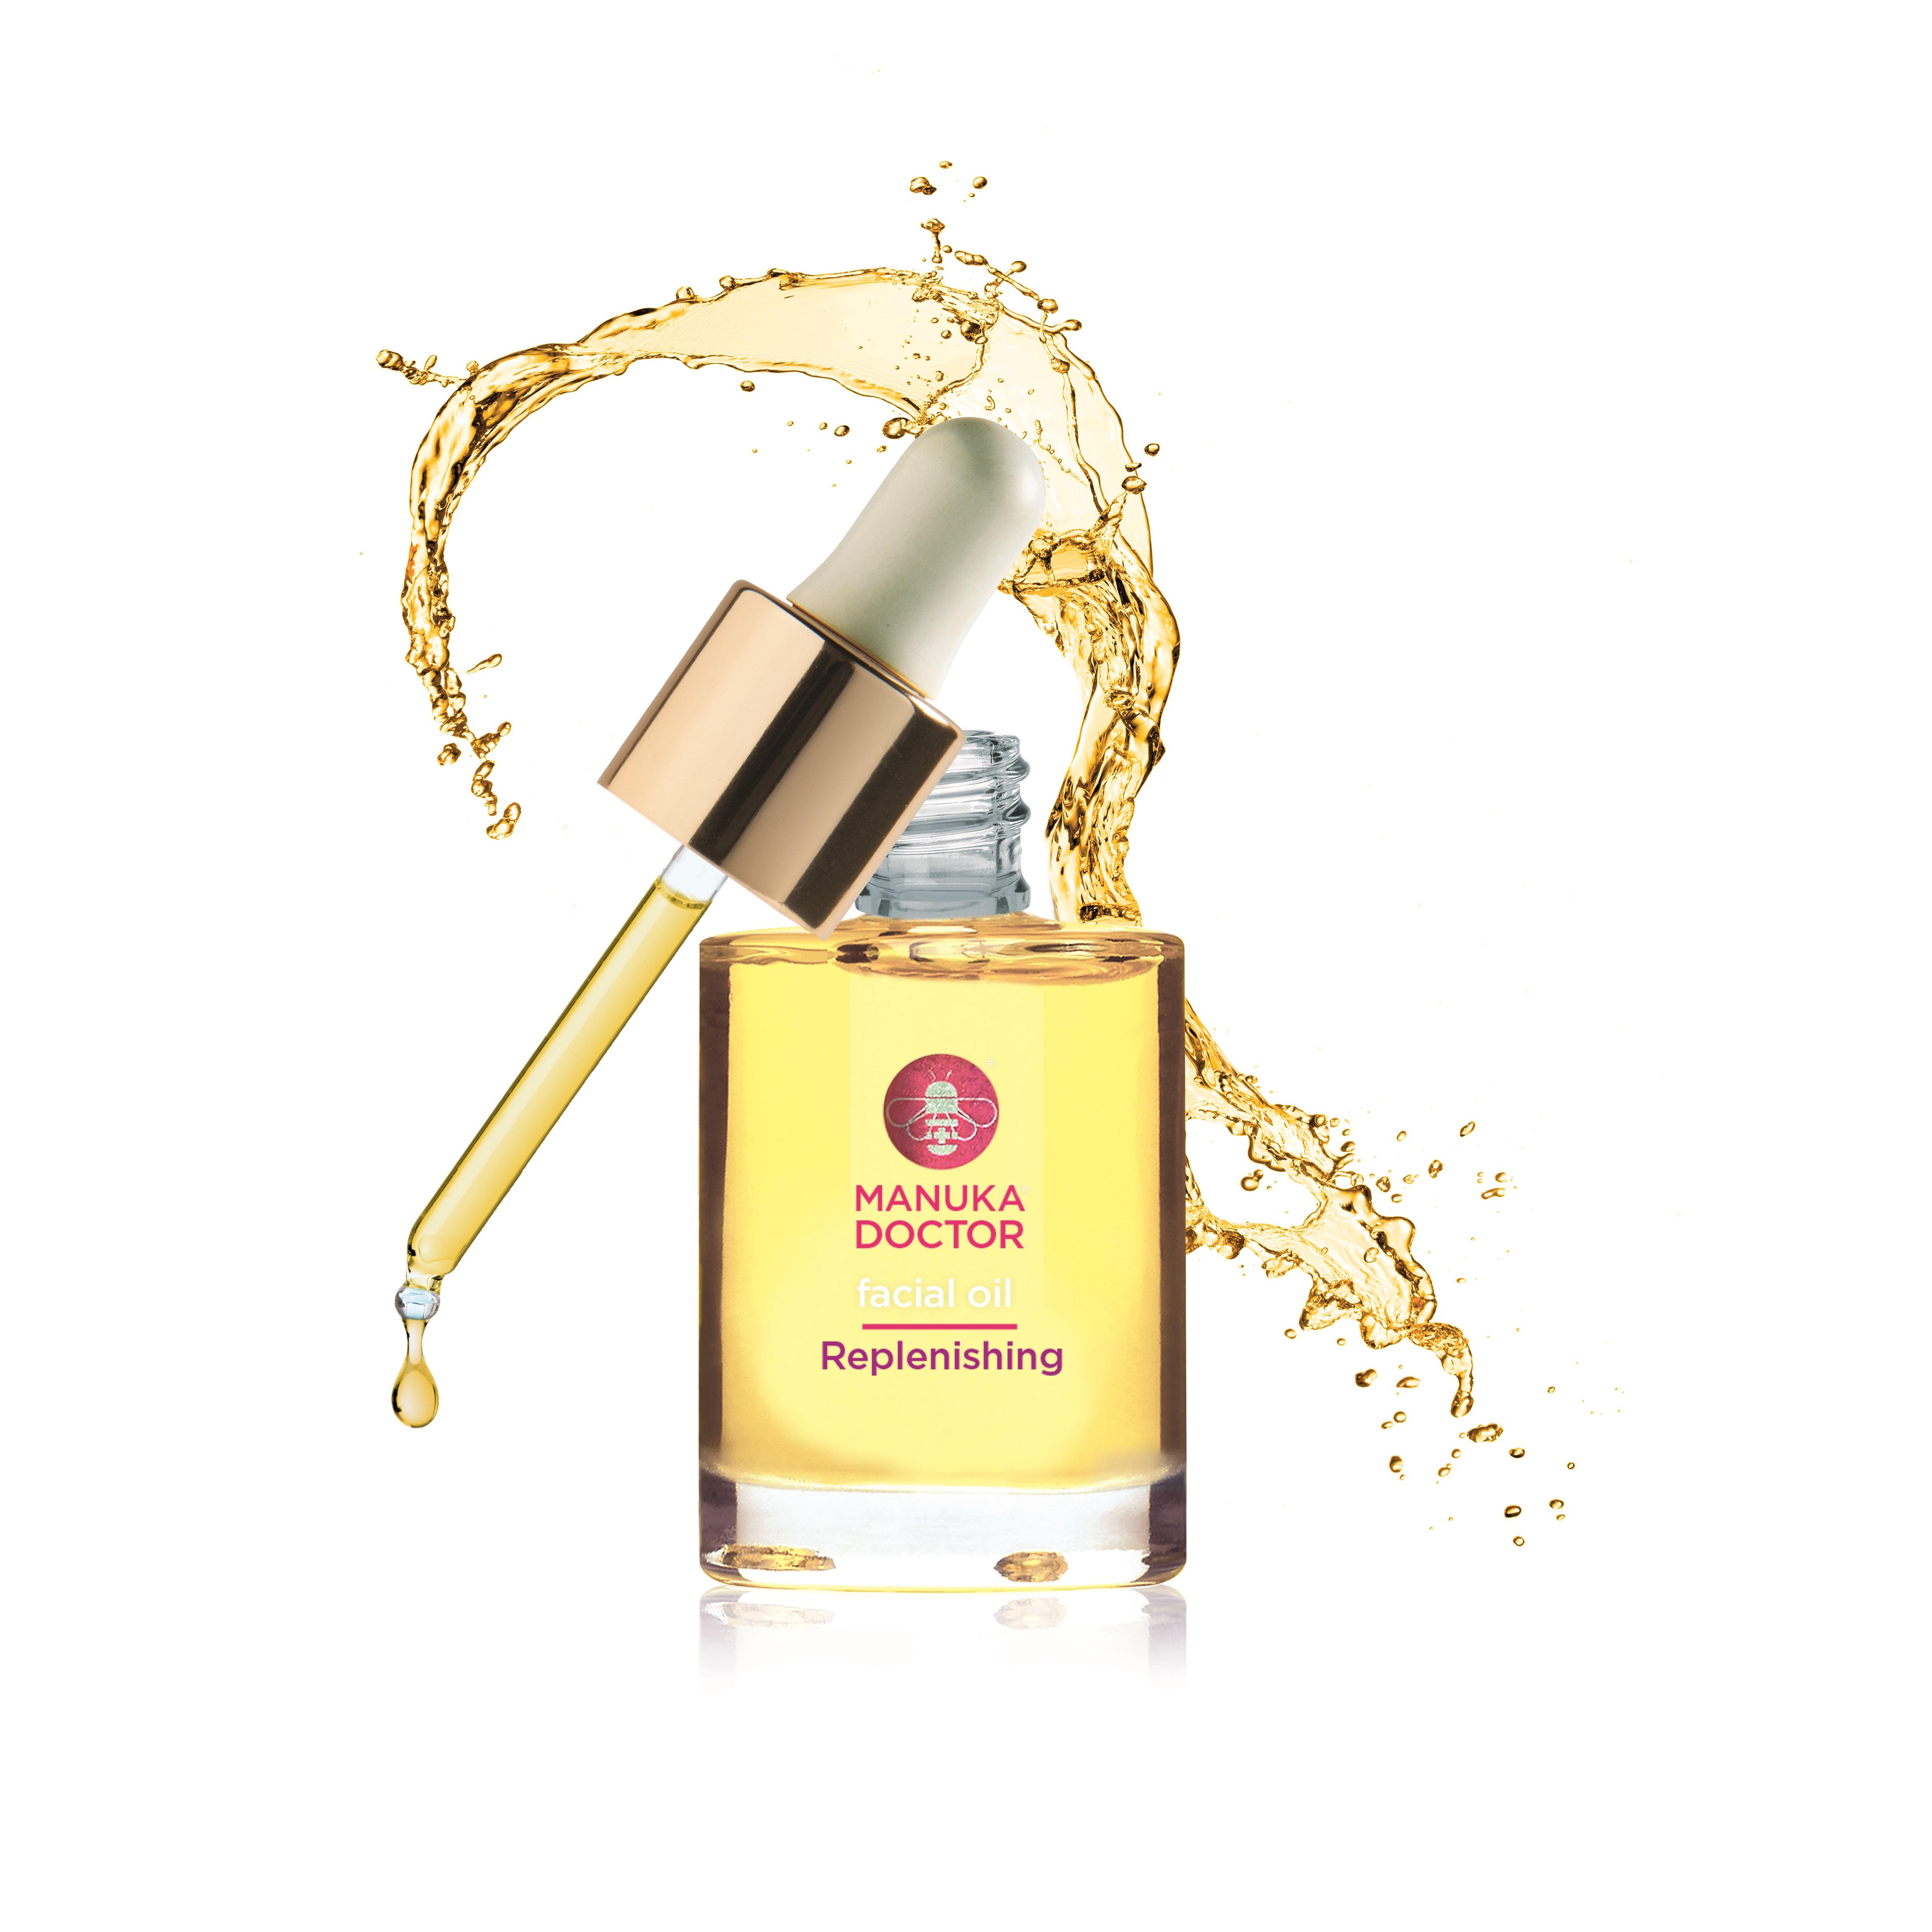 manuka-doctor-replenishing-facial-oil-with-splash